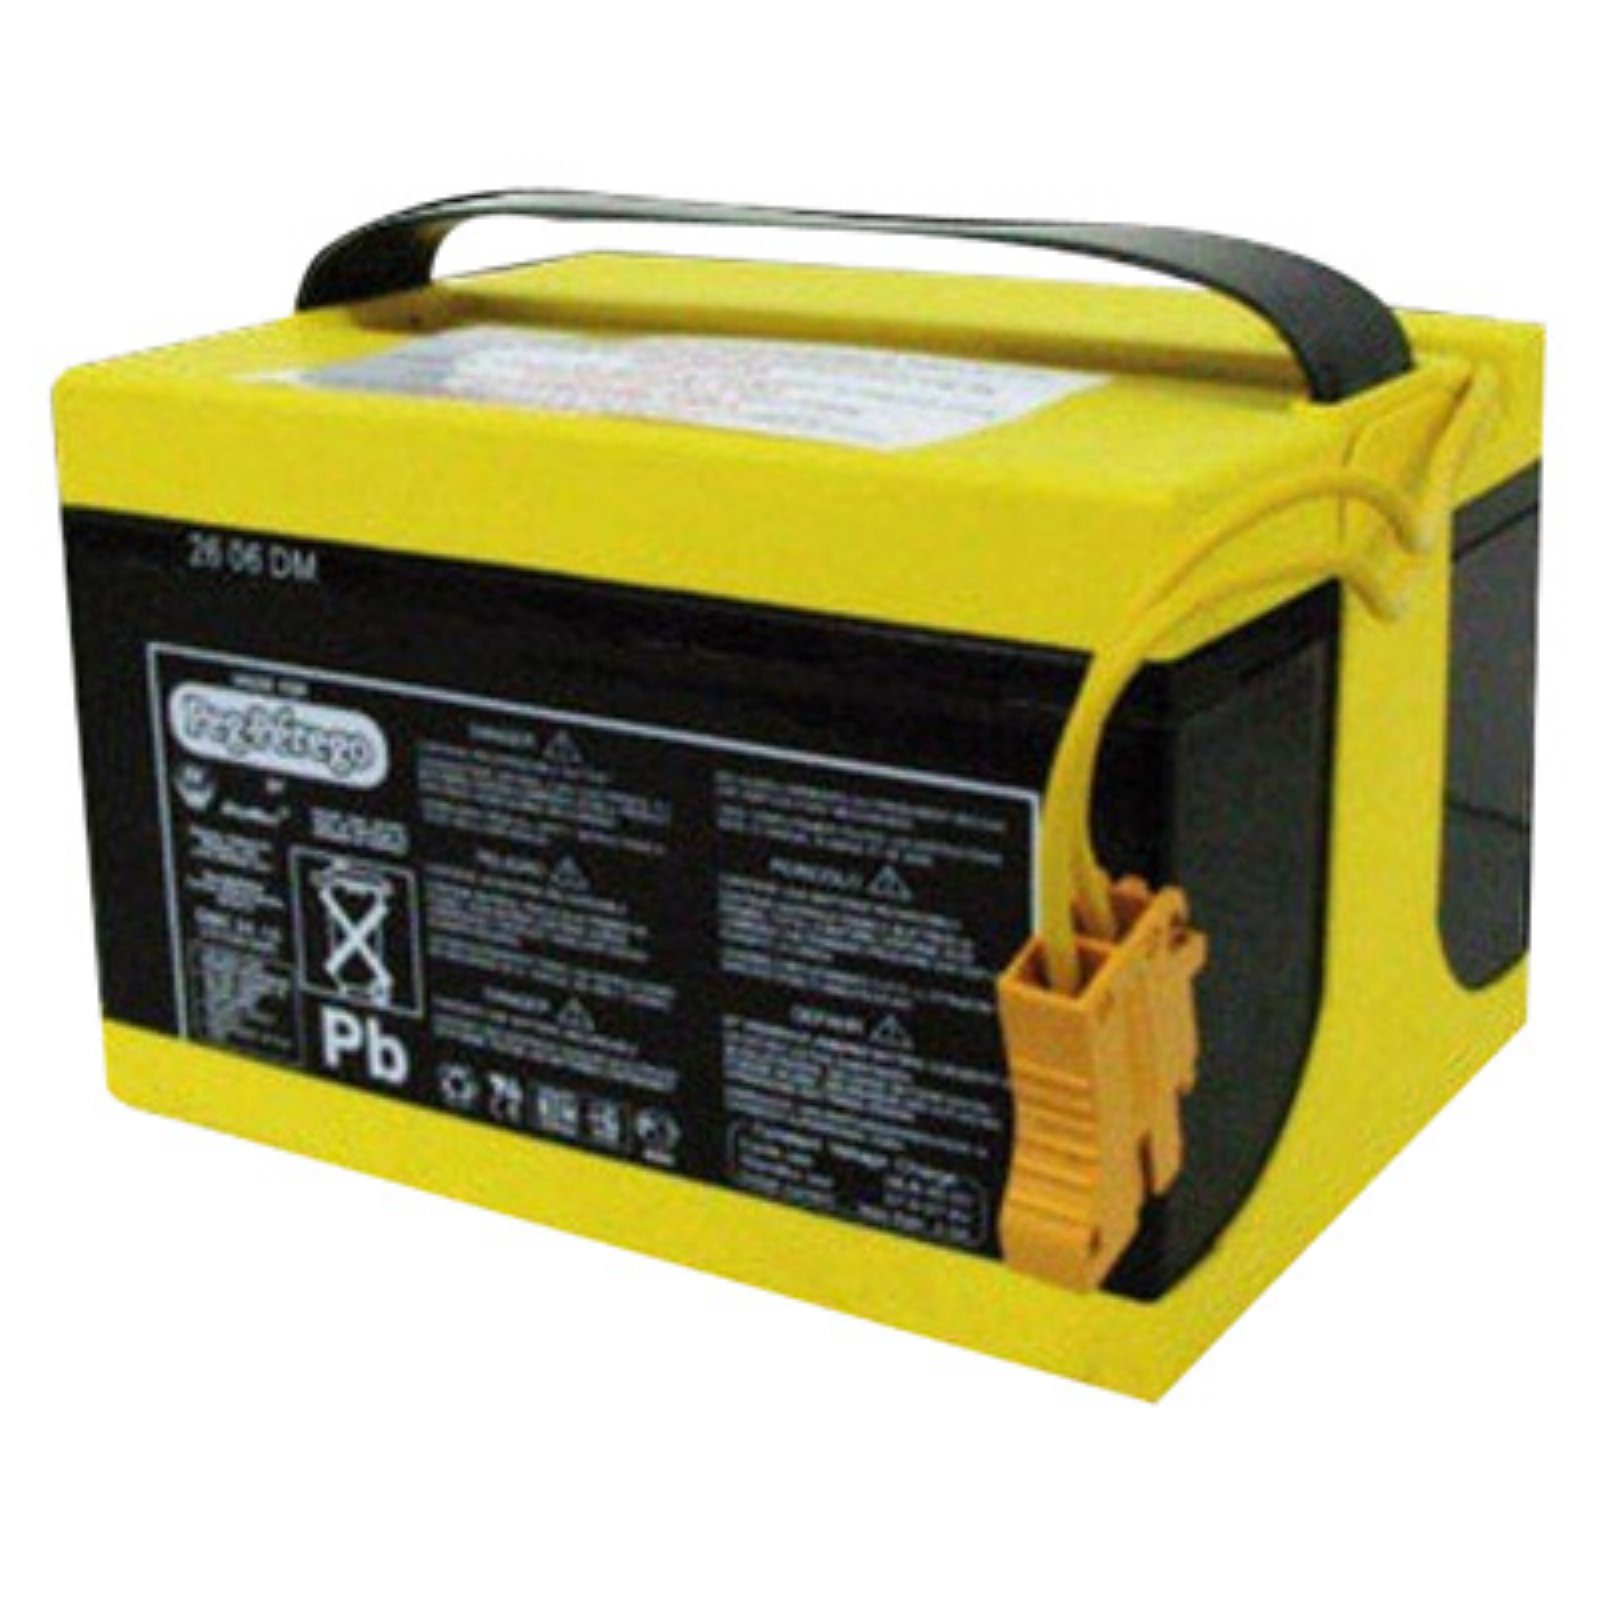 Peg Perego 24 Volt Rechargeable Battery